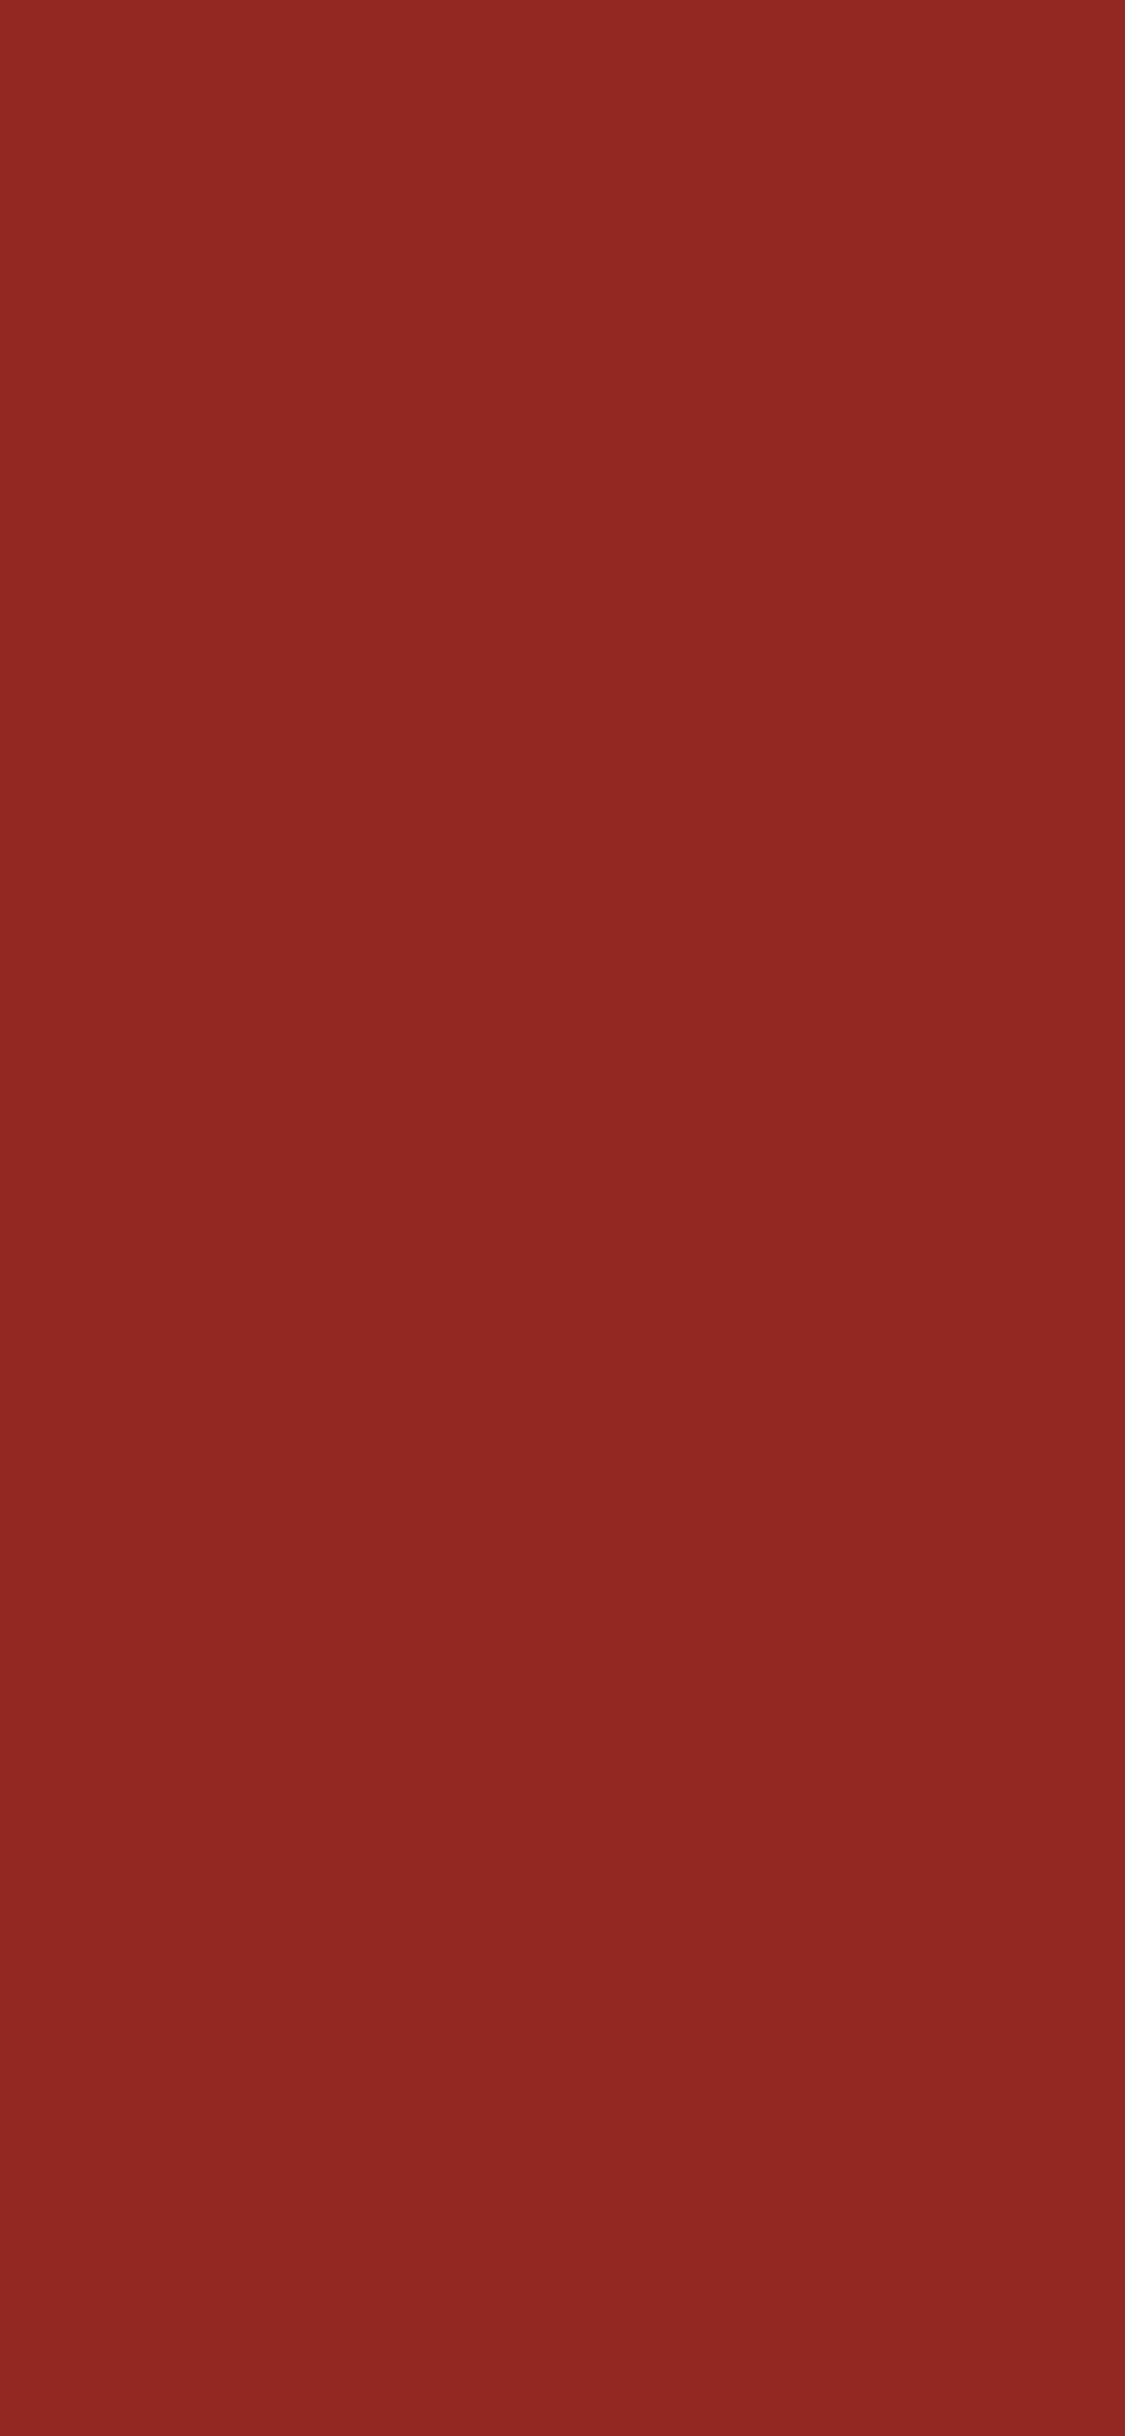 1125x2436 Vivid Auburn Solid Color Background